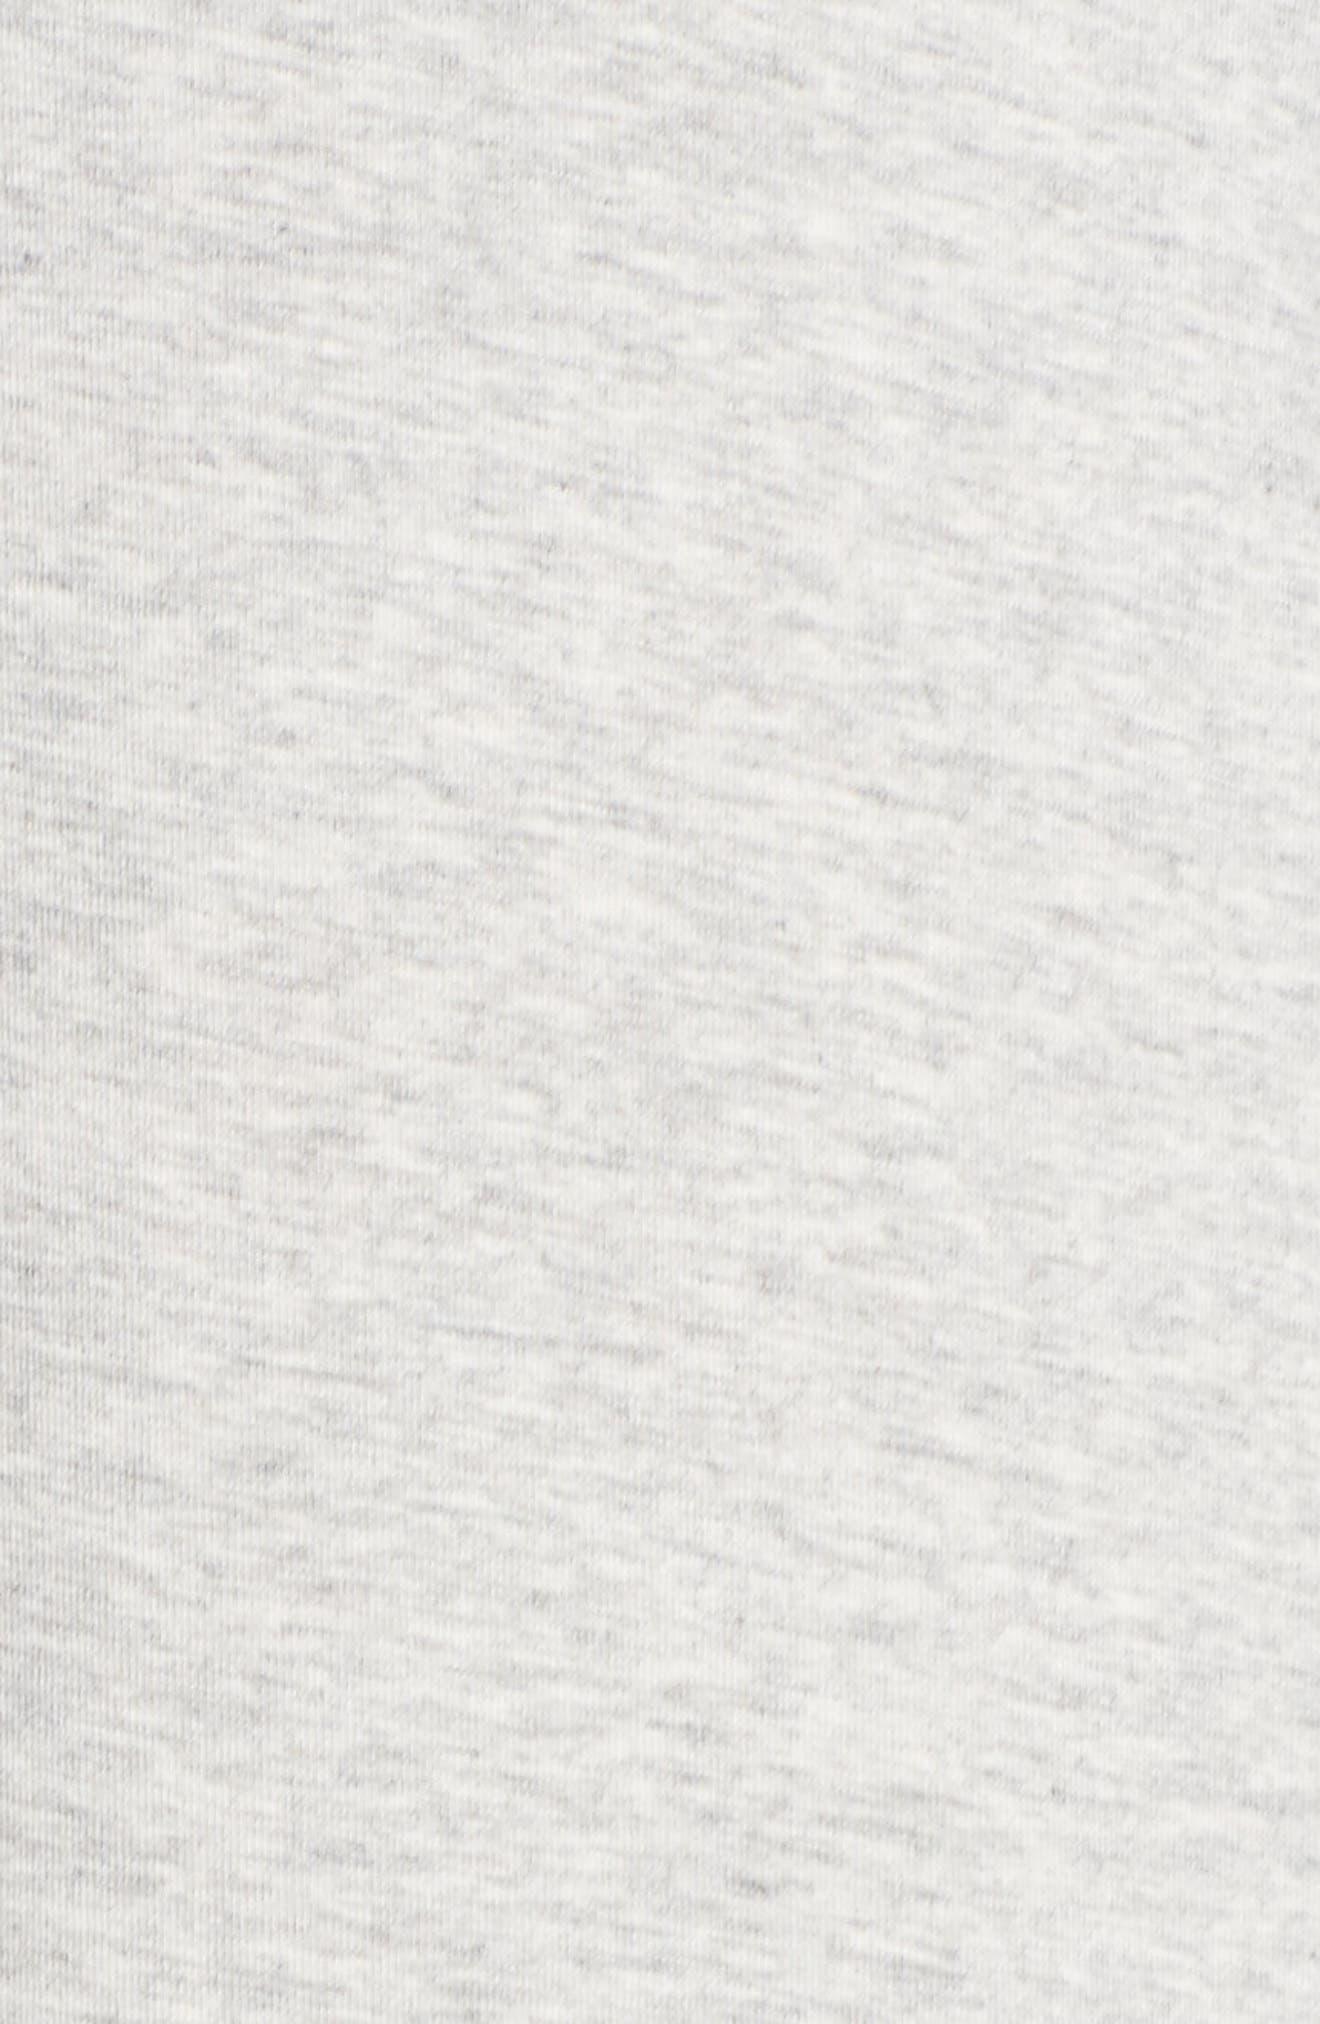 Dolman Sleeve Nightshirt,                             Alternate thumbnail 18, color,